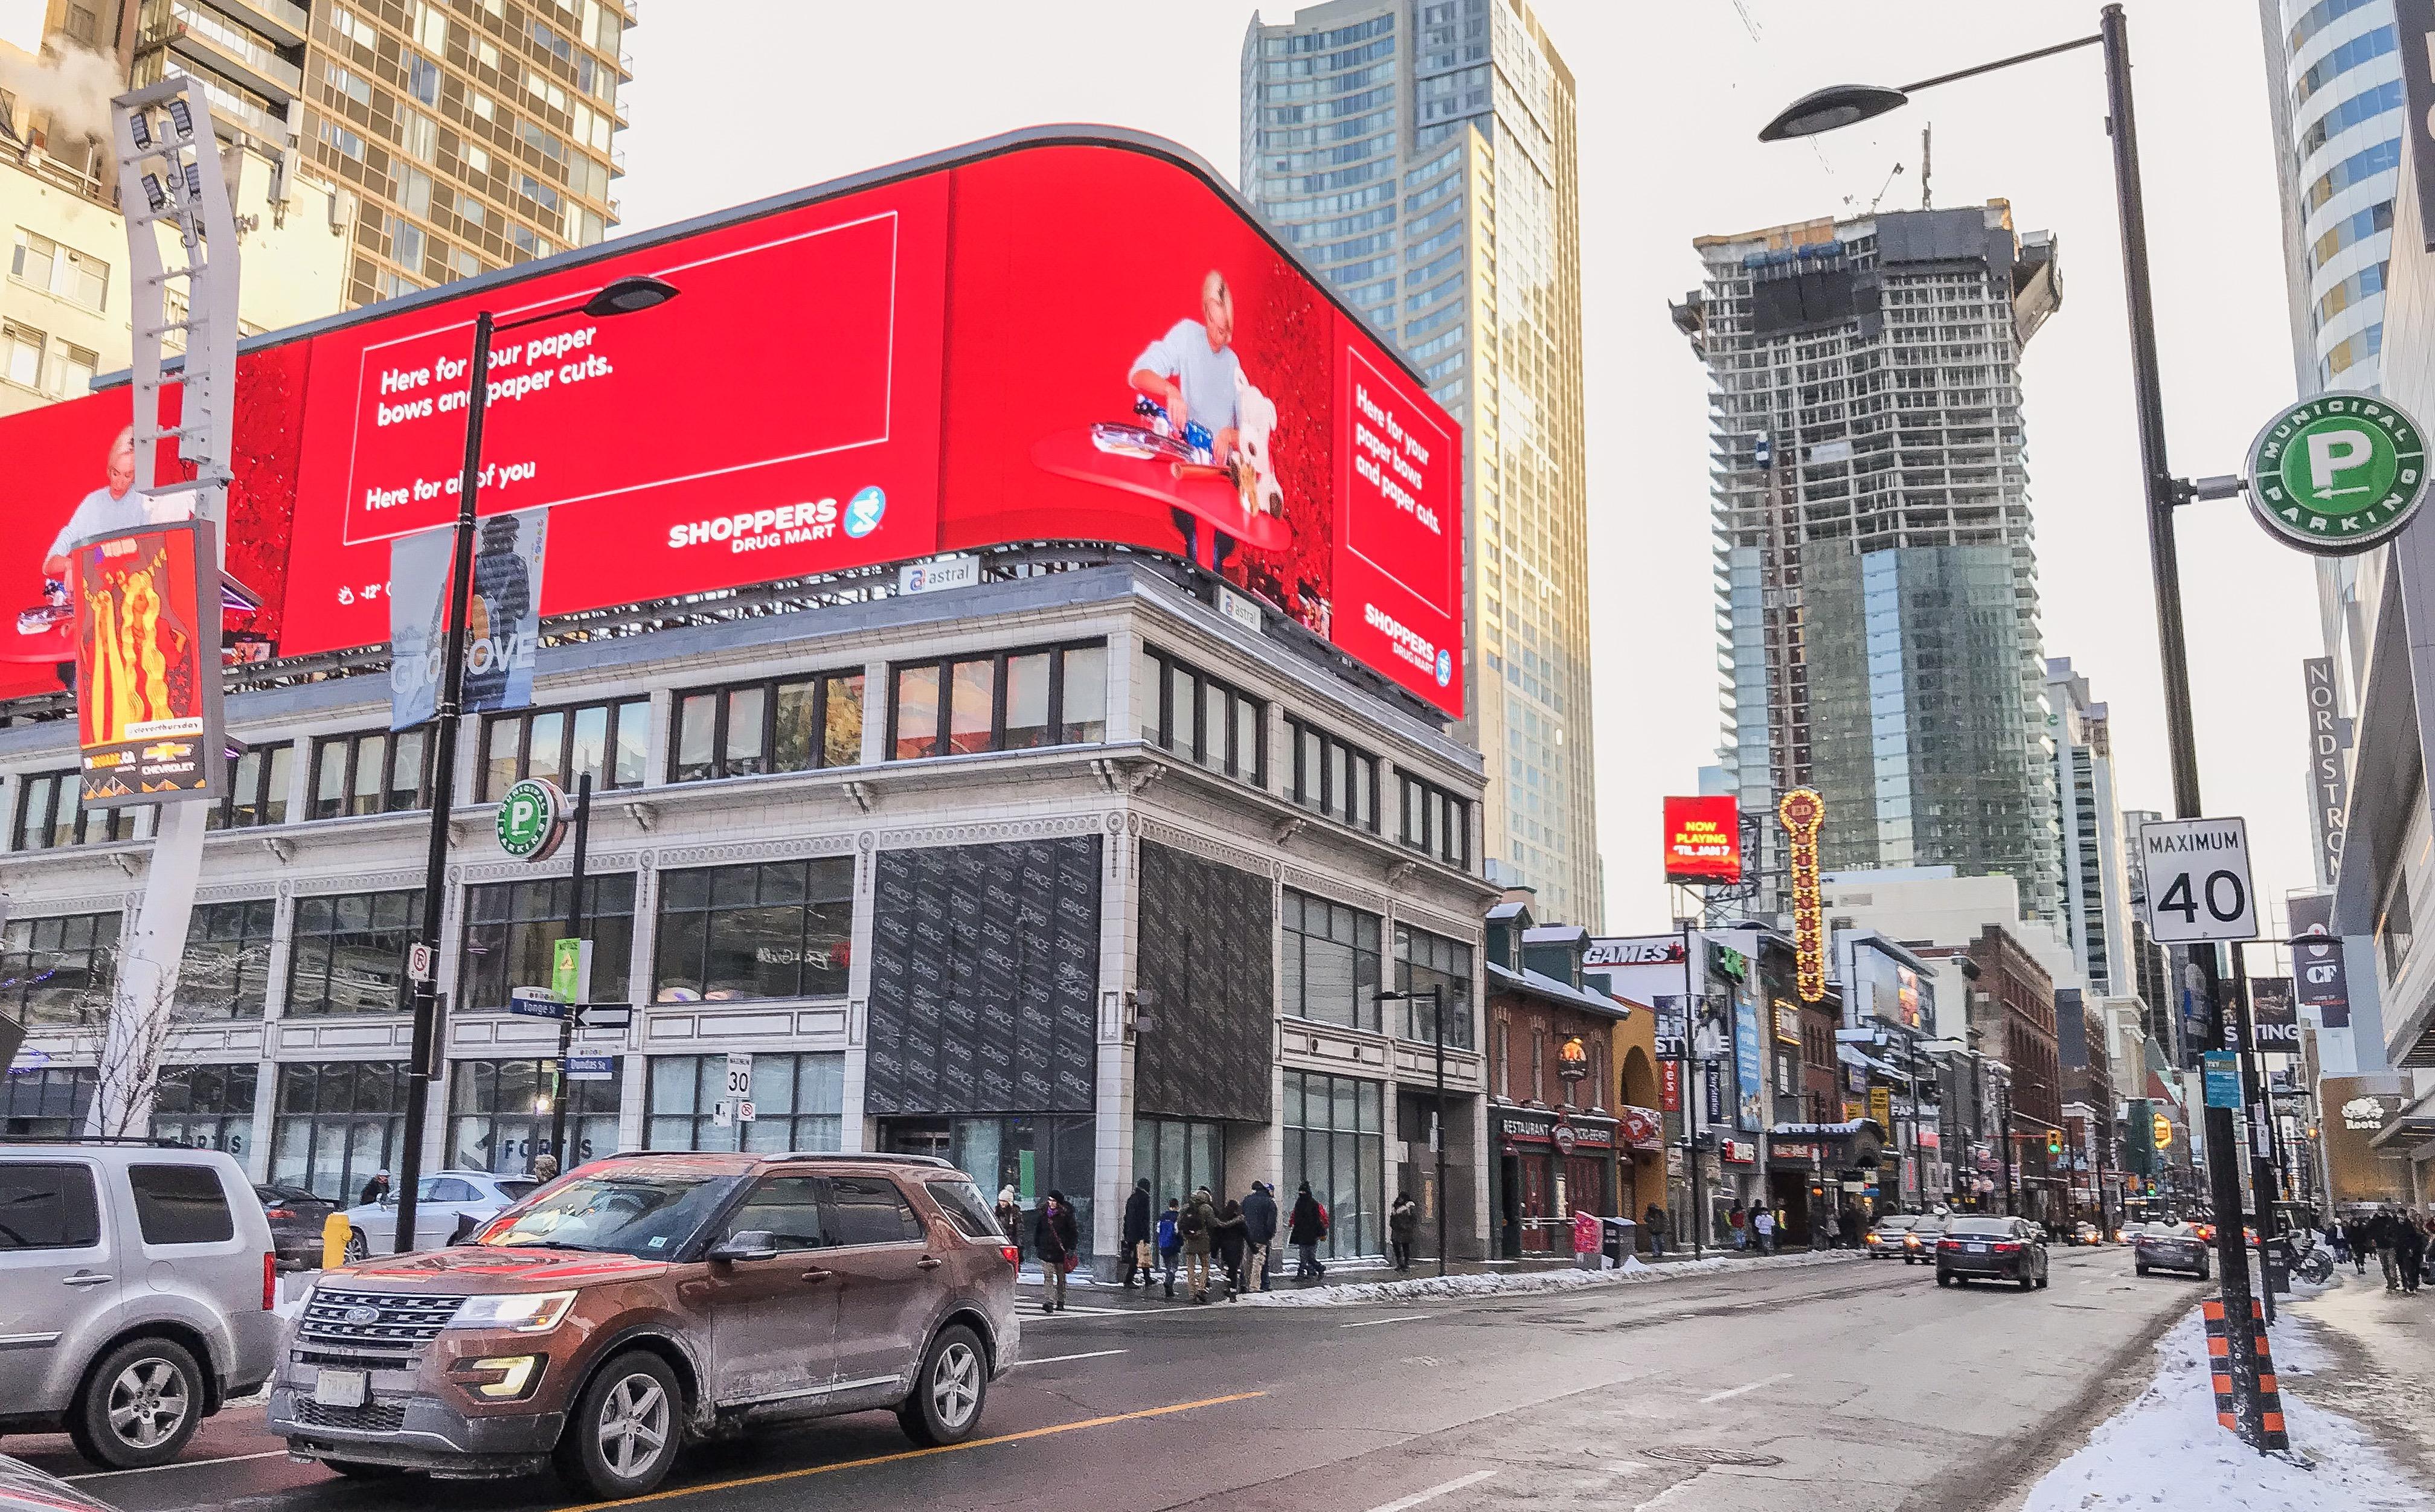 Yonge-Dundas Square_DownTown Toronto – Snippets of Suri